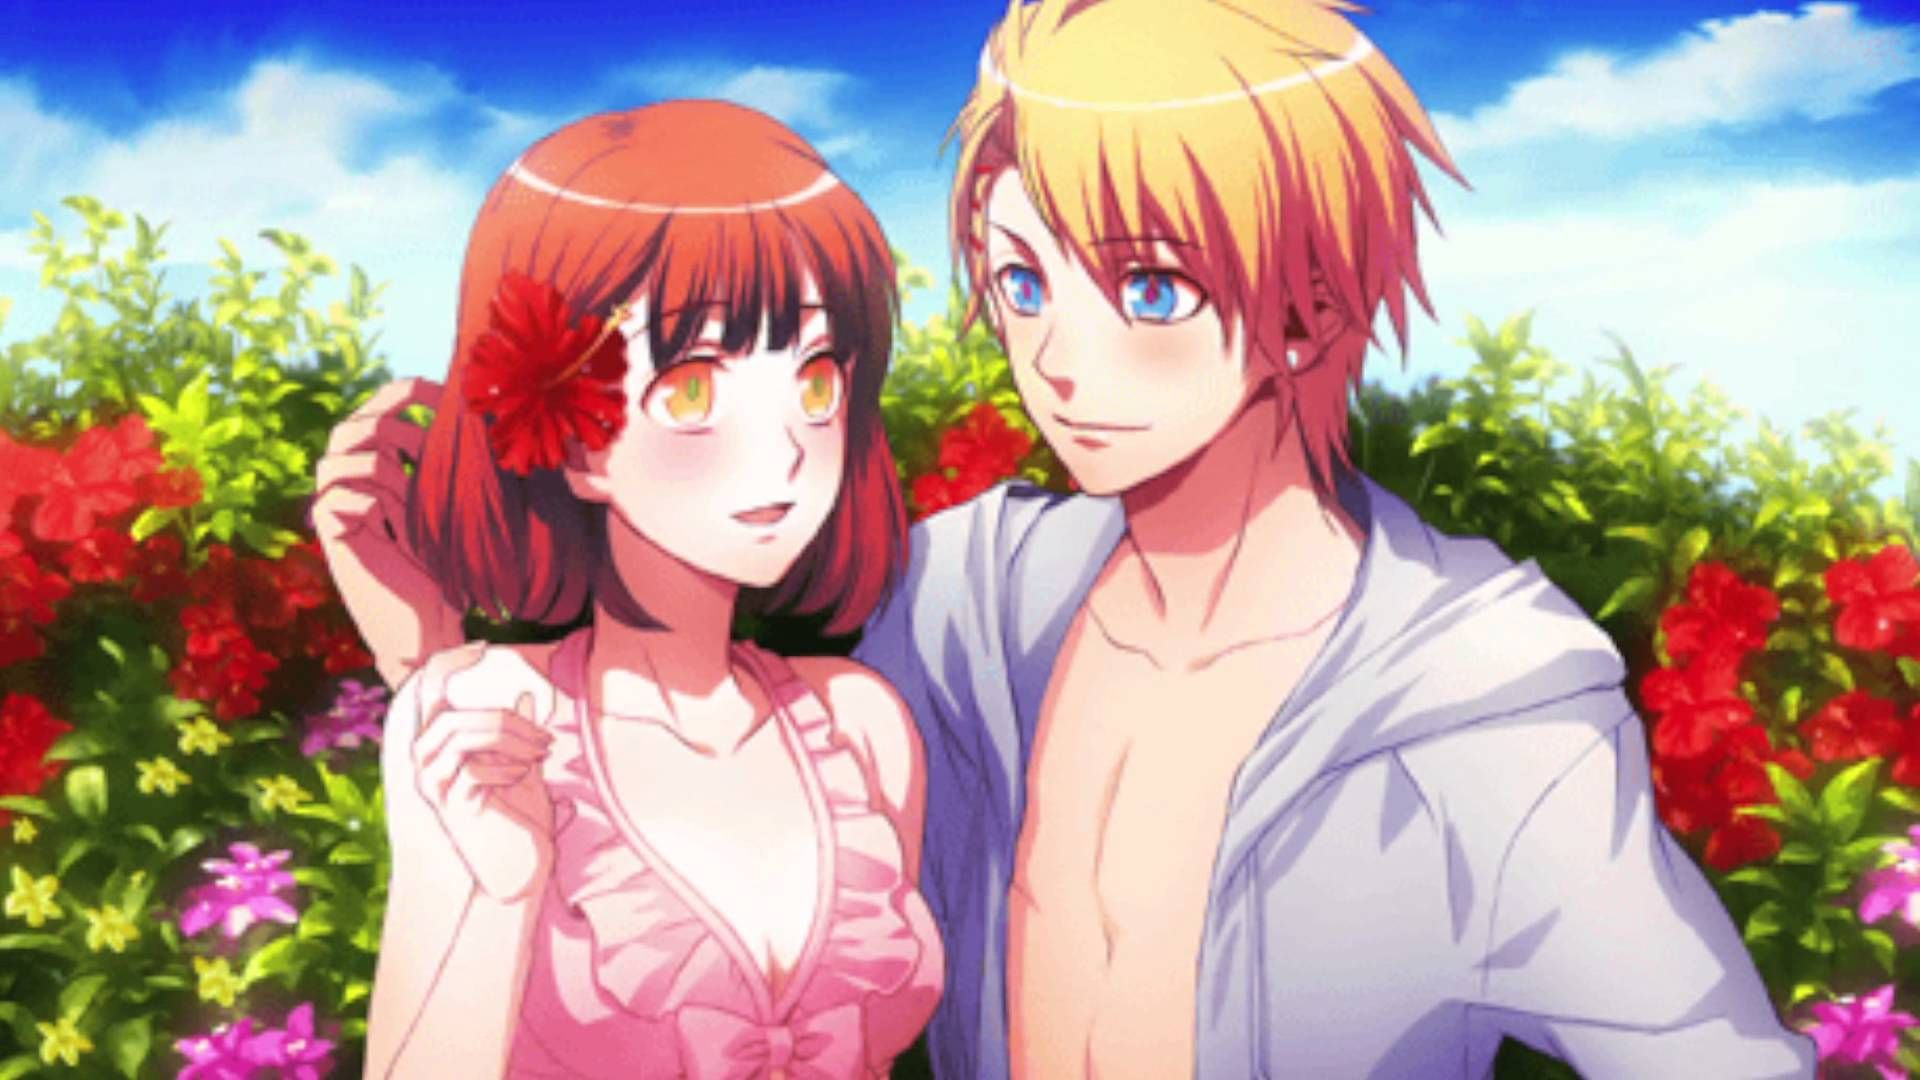 My Top 10 Reverse Harem Anime List